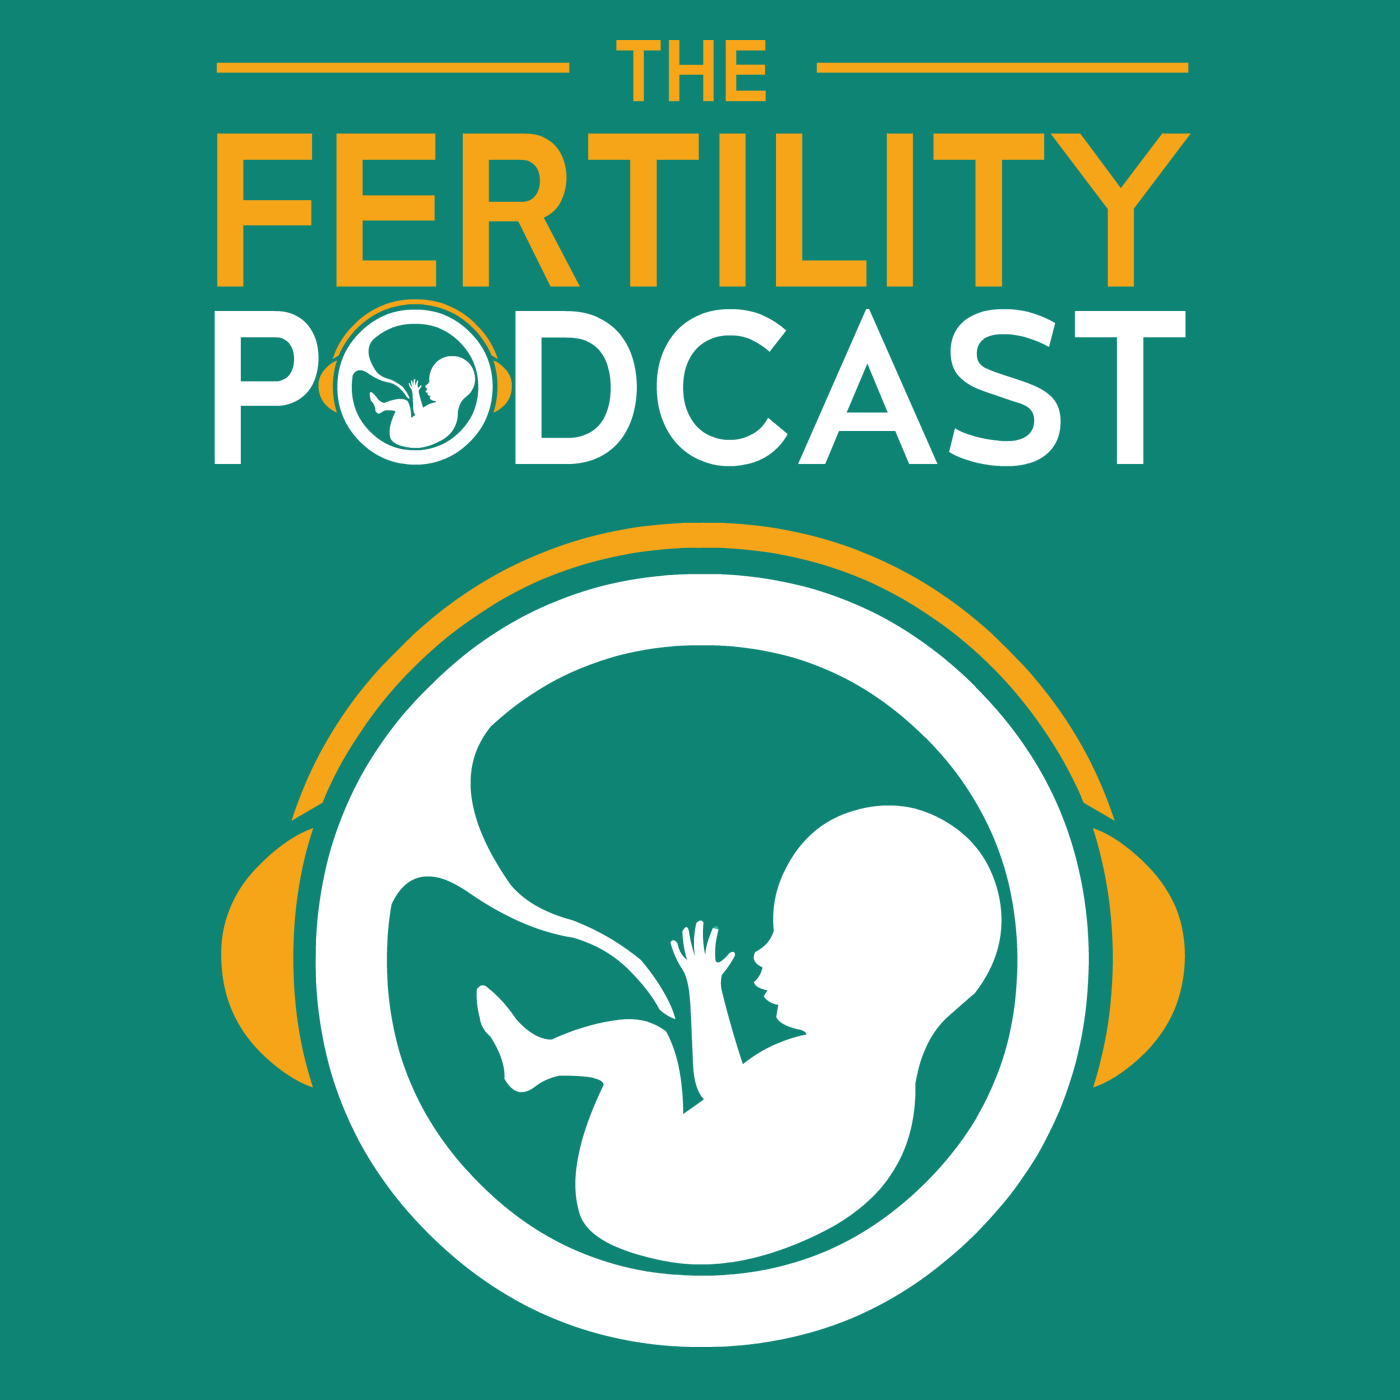 The Fertility Podcast show art